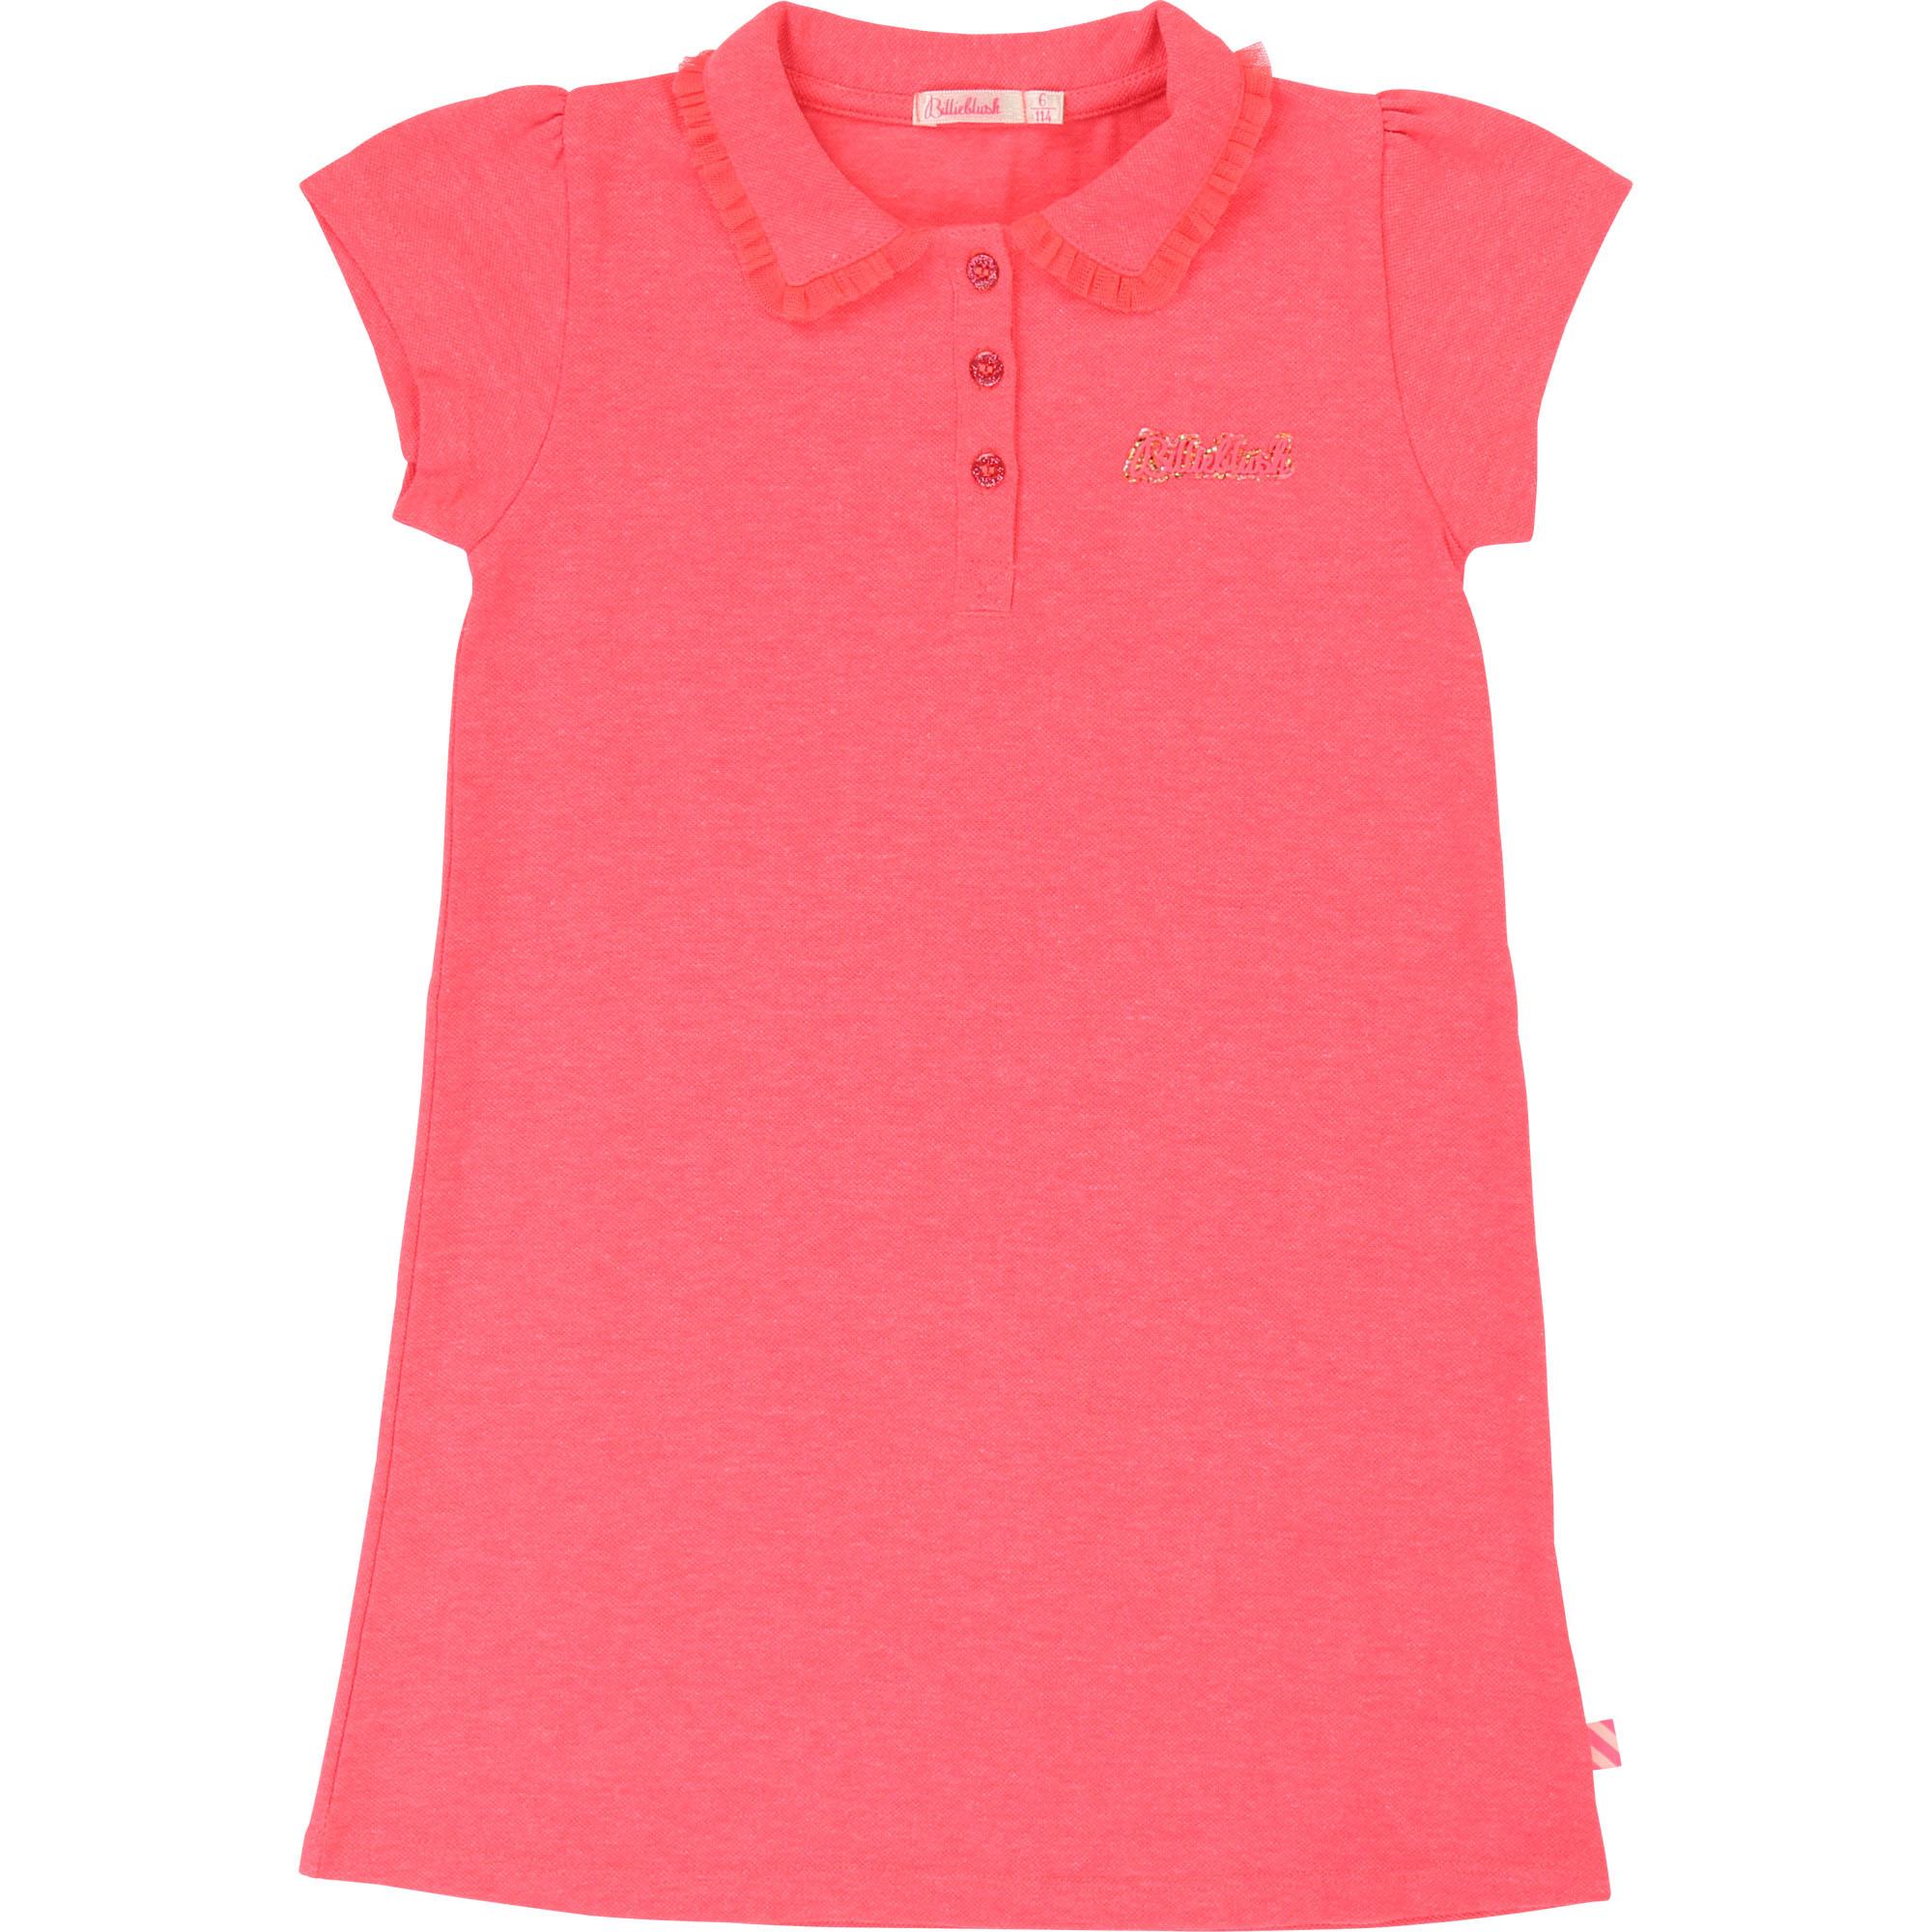 8721ee60e93fc Billieblush Girl s Dress